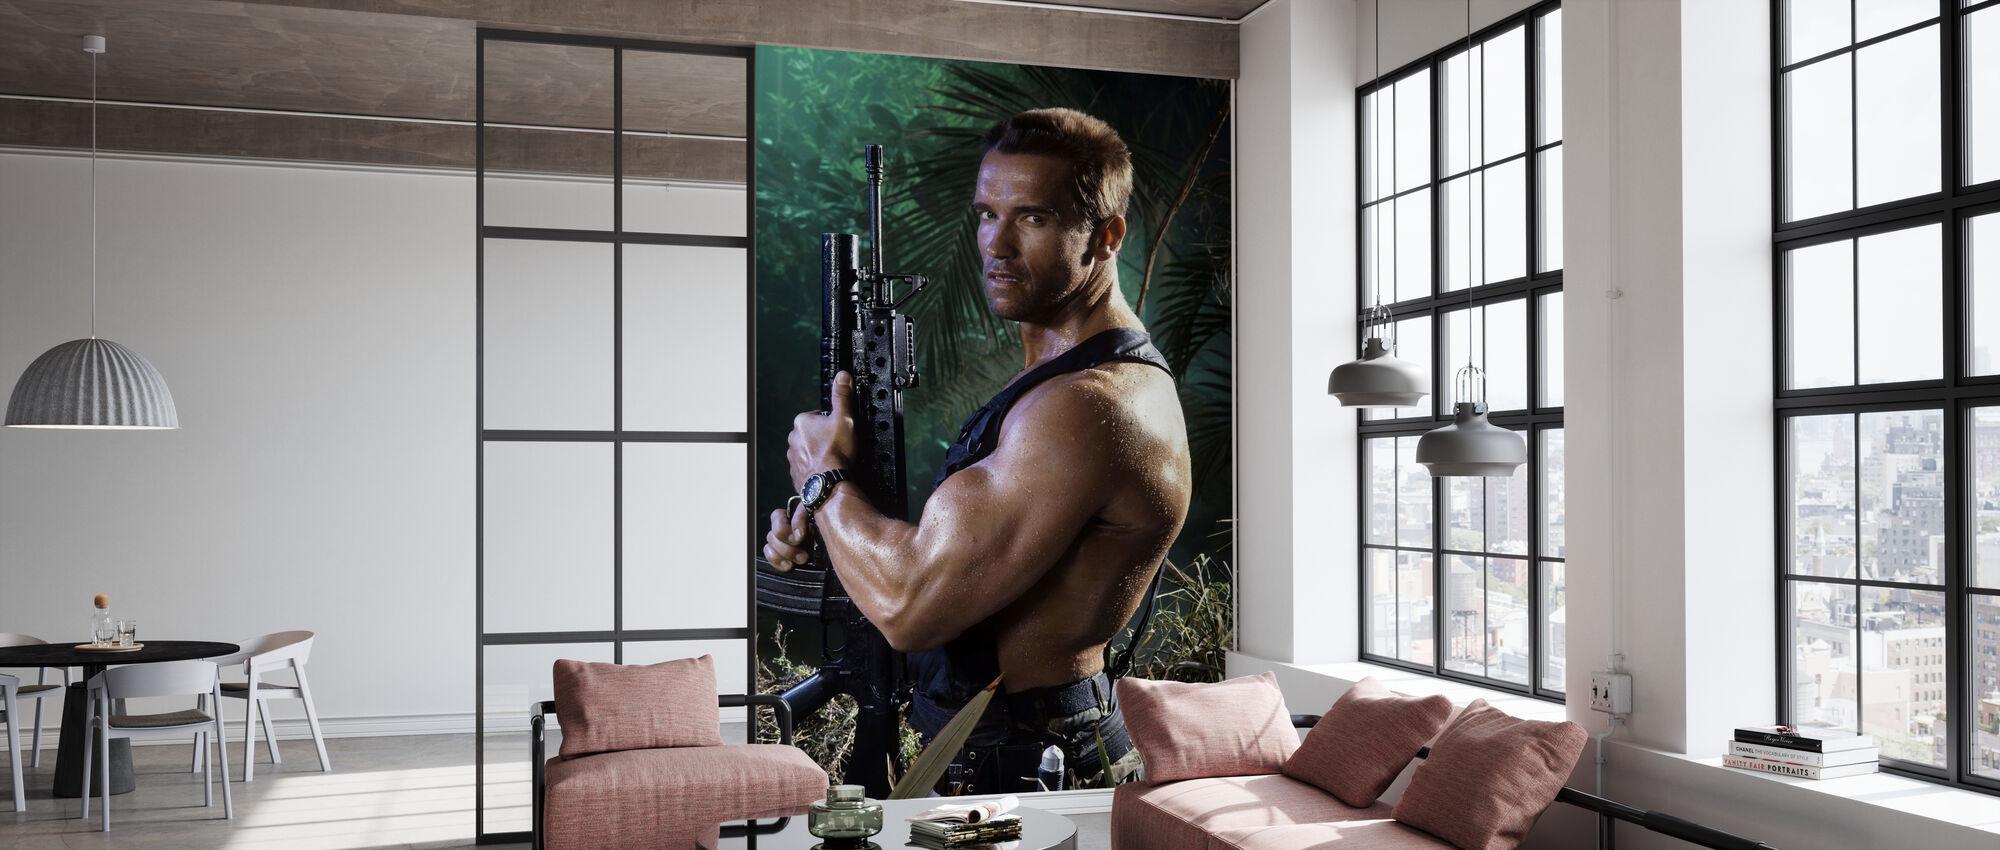 Arnold Schwarzenegger in Predator - Wallpaper - Office